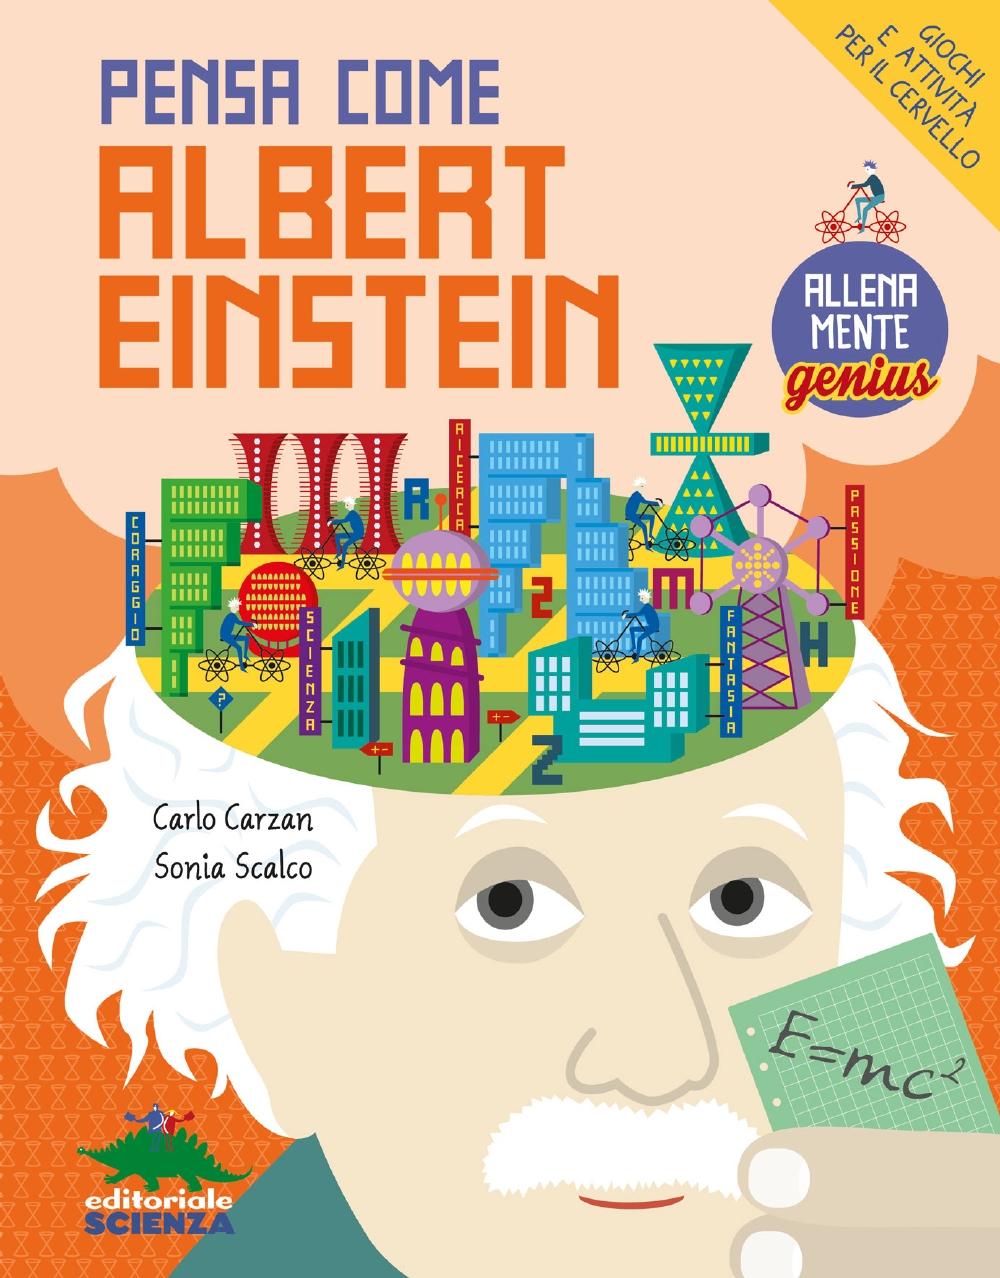 Allenamente Genius - Pensa come Albert Einstein